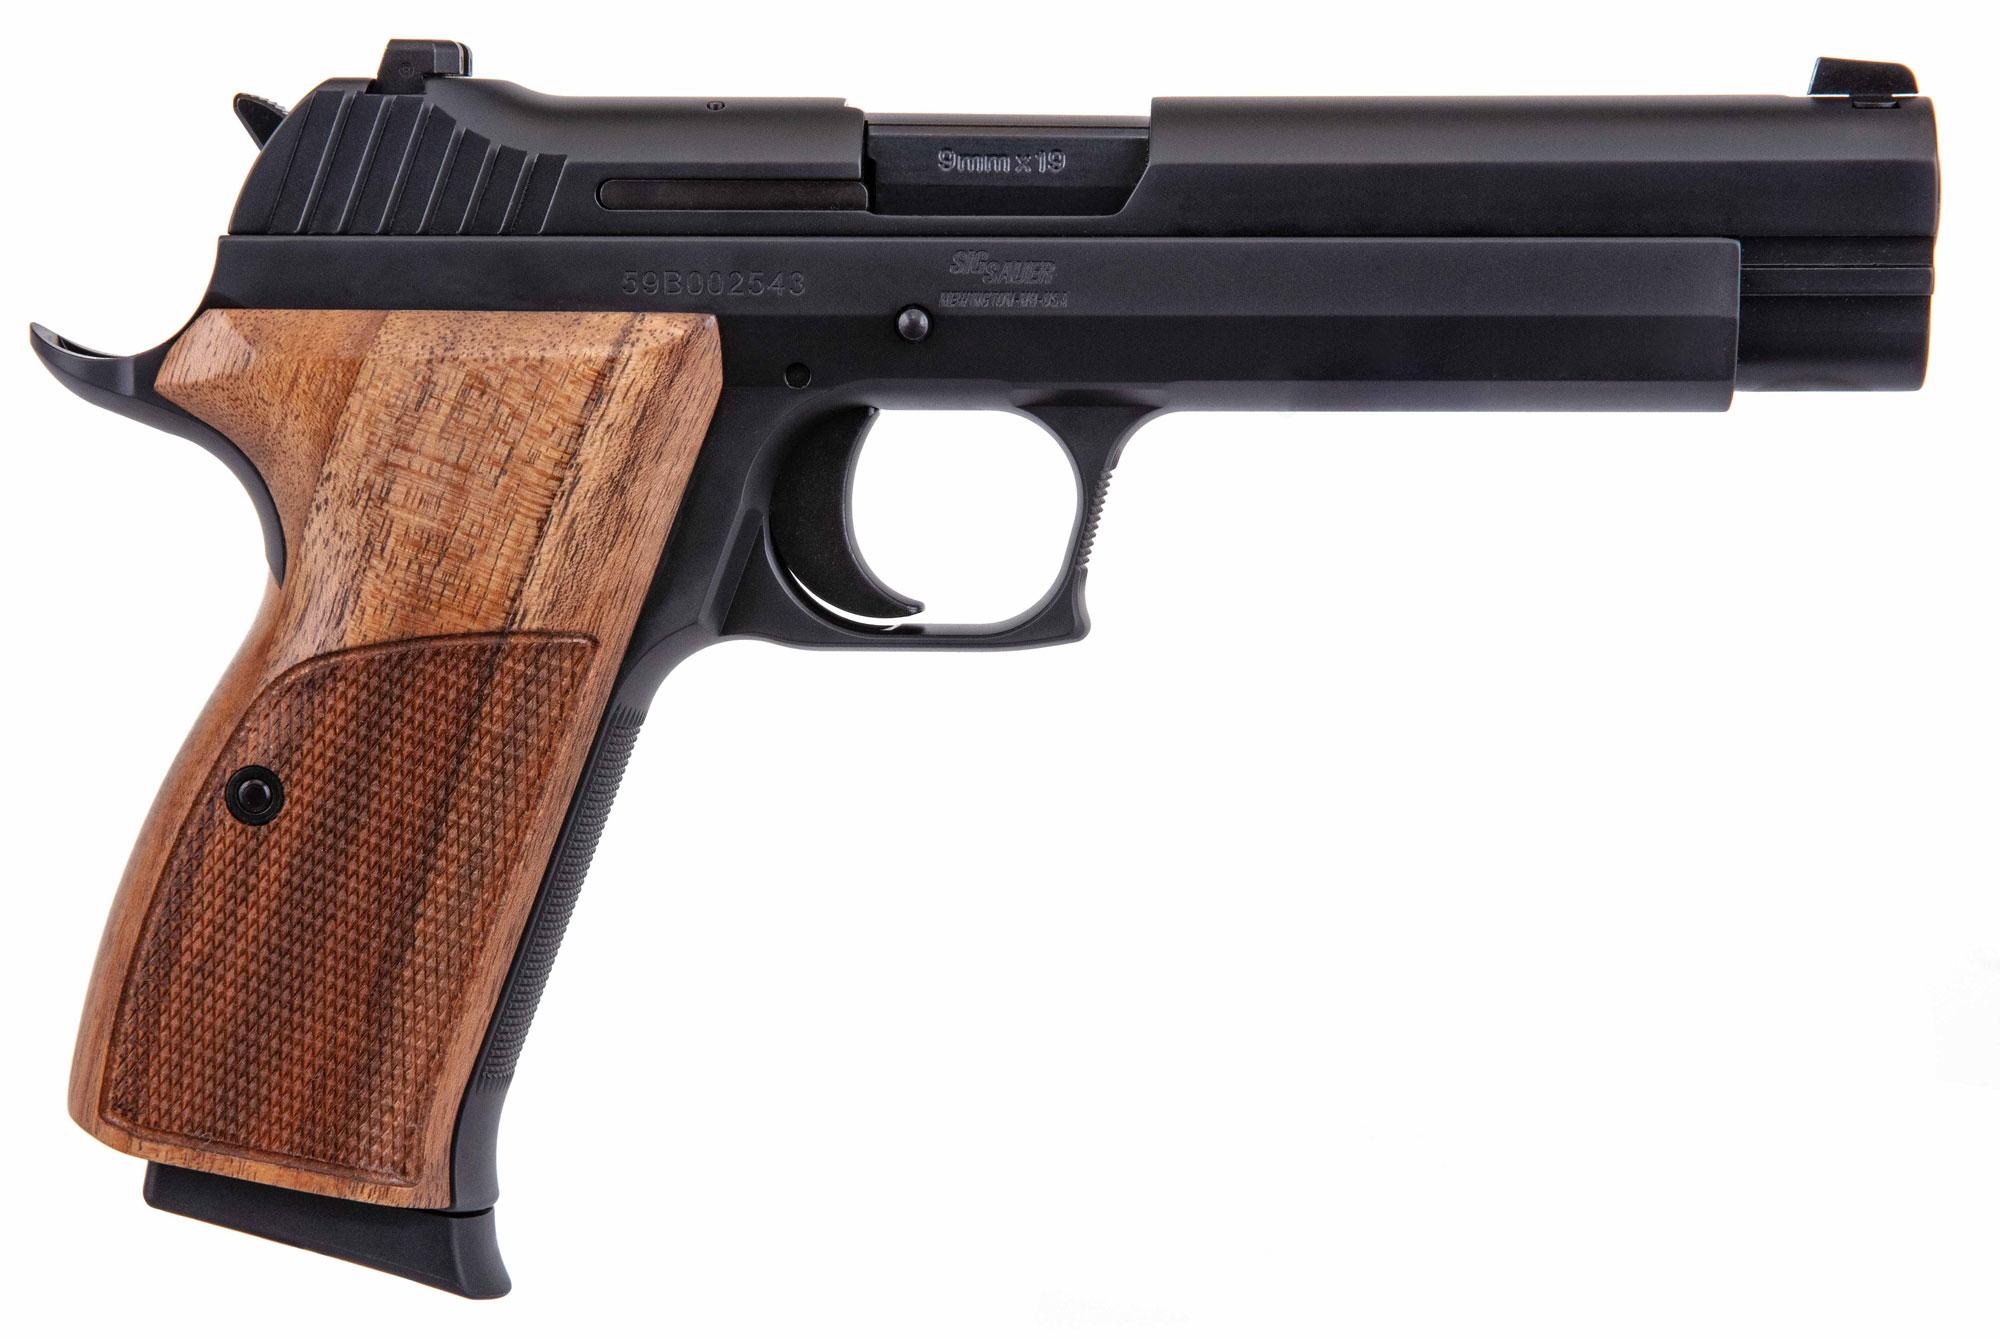 Sig Sauer P210 SAO 9mm Handgun